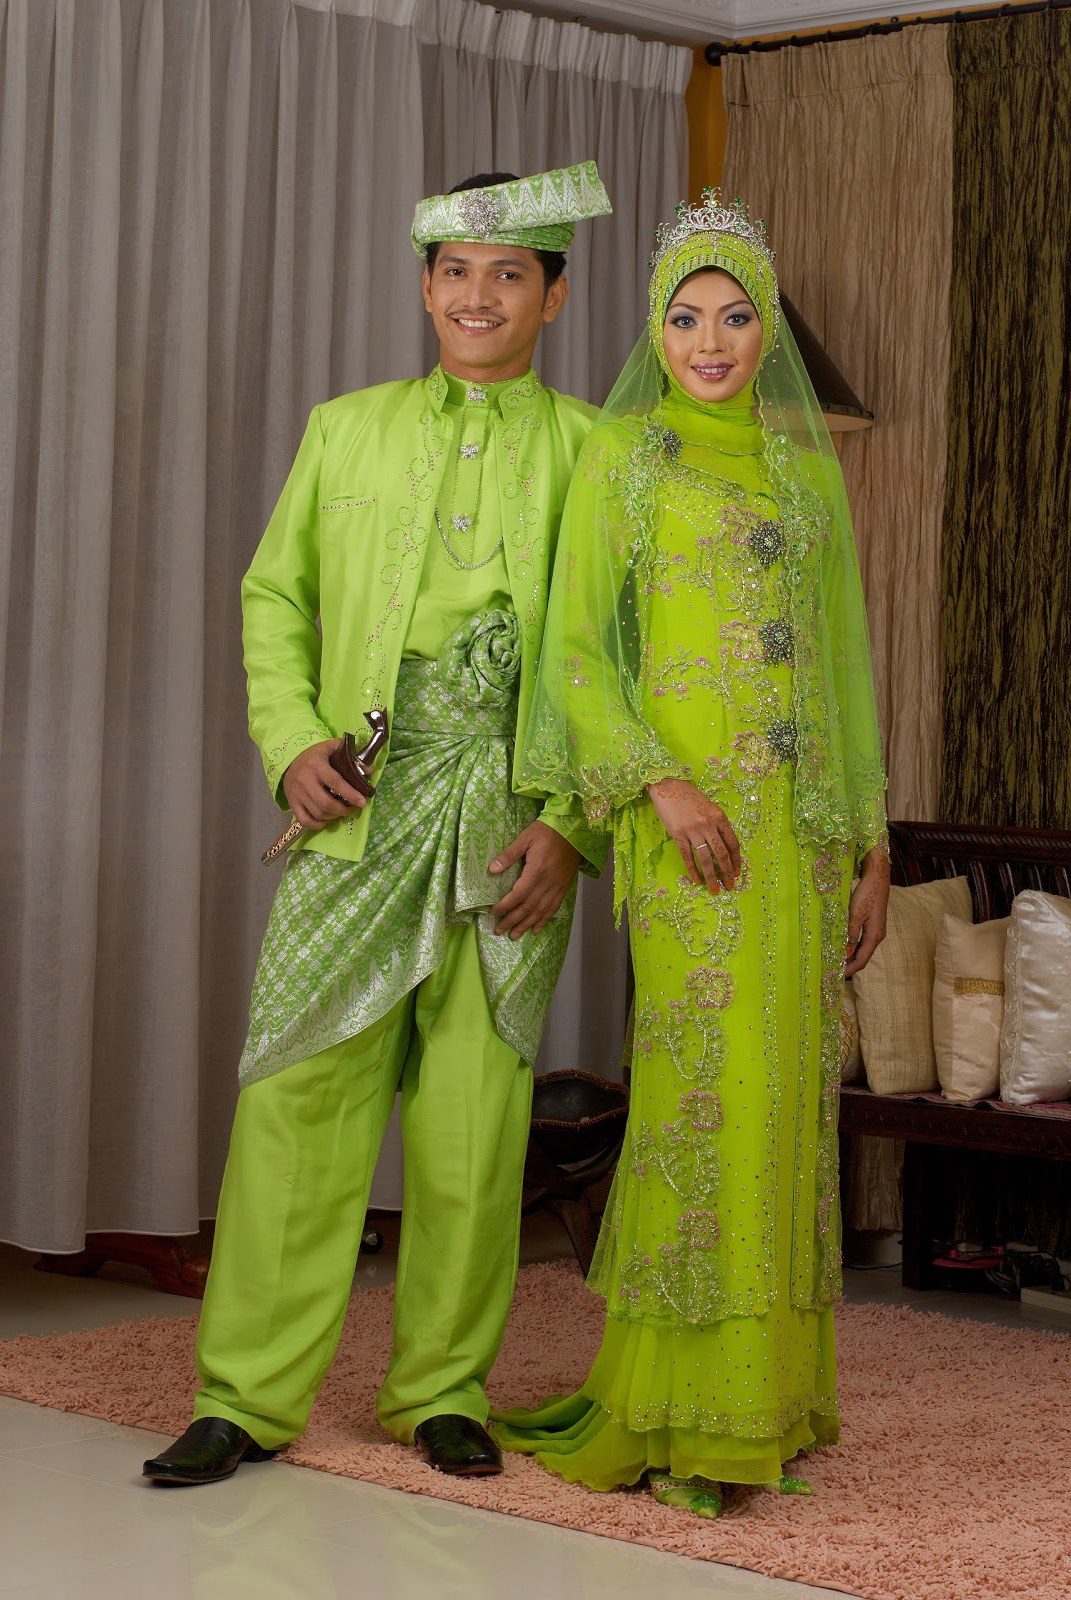 Design Gaun Pengantin Muslimah Syar'i Rabbani U3dh Harga Baju Pengantin Muslimah Harga Baju Pengantin